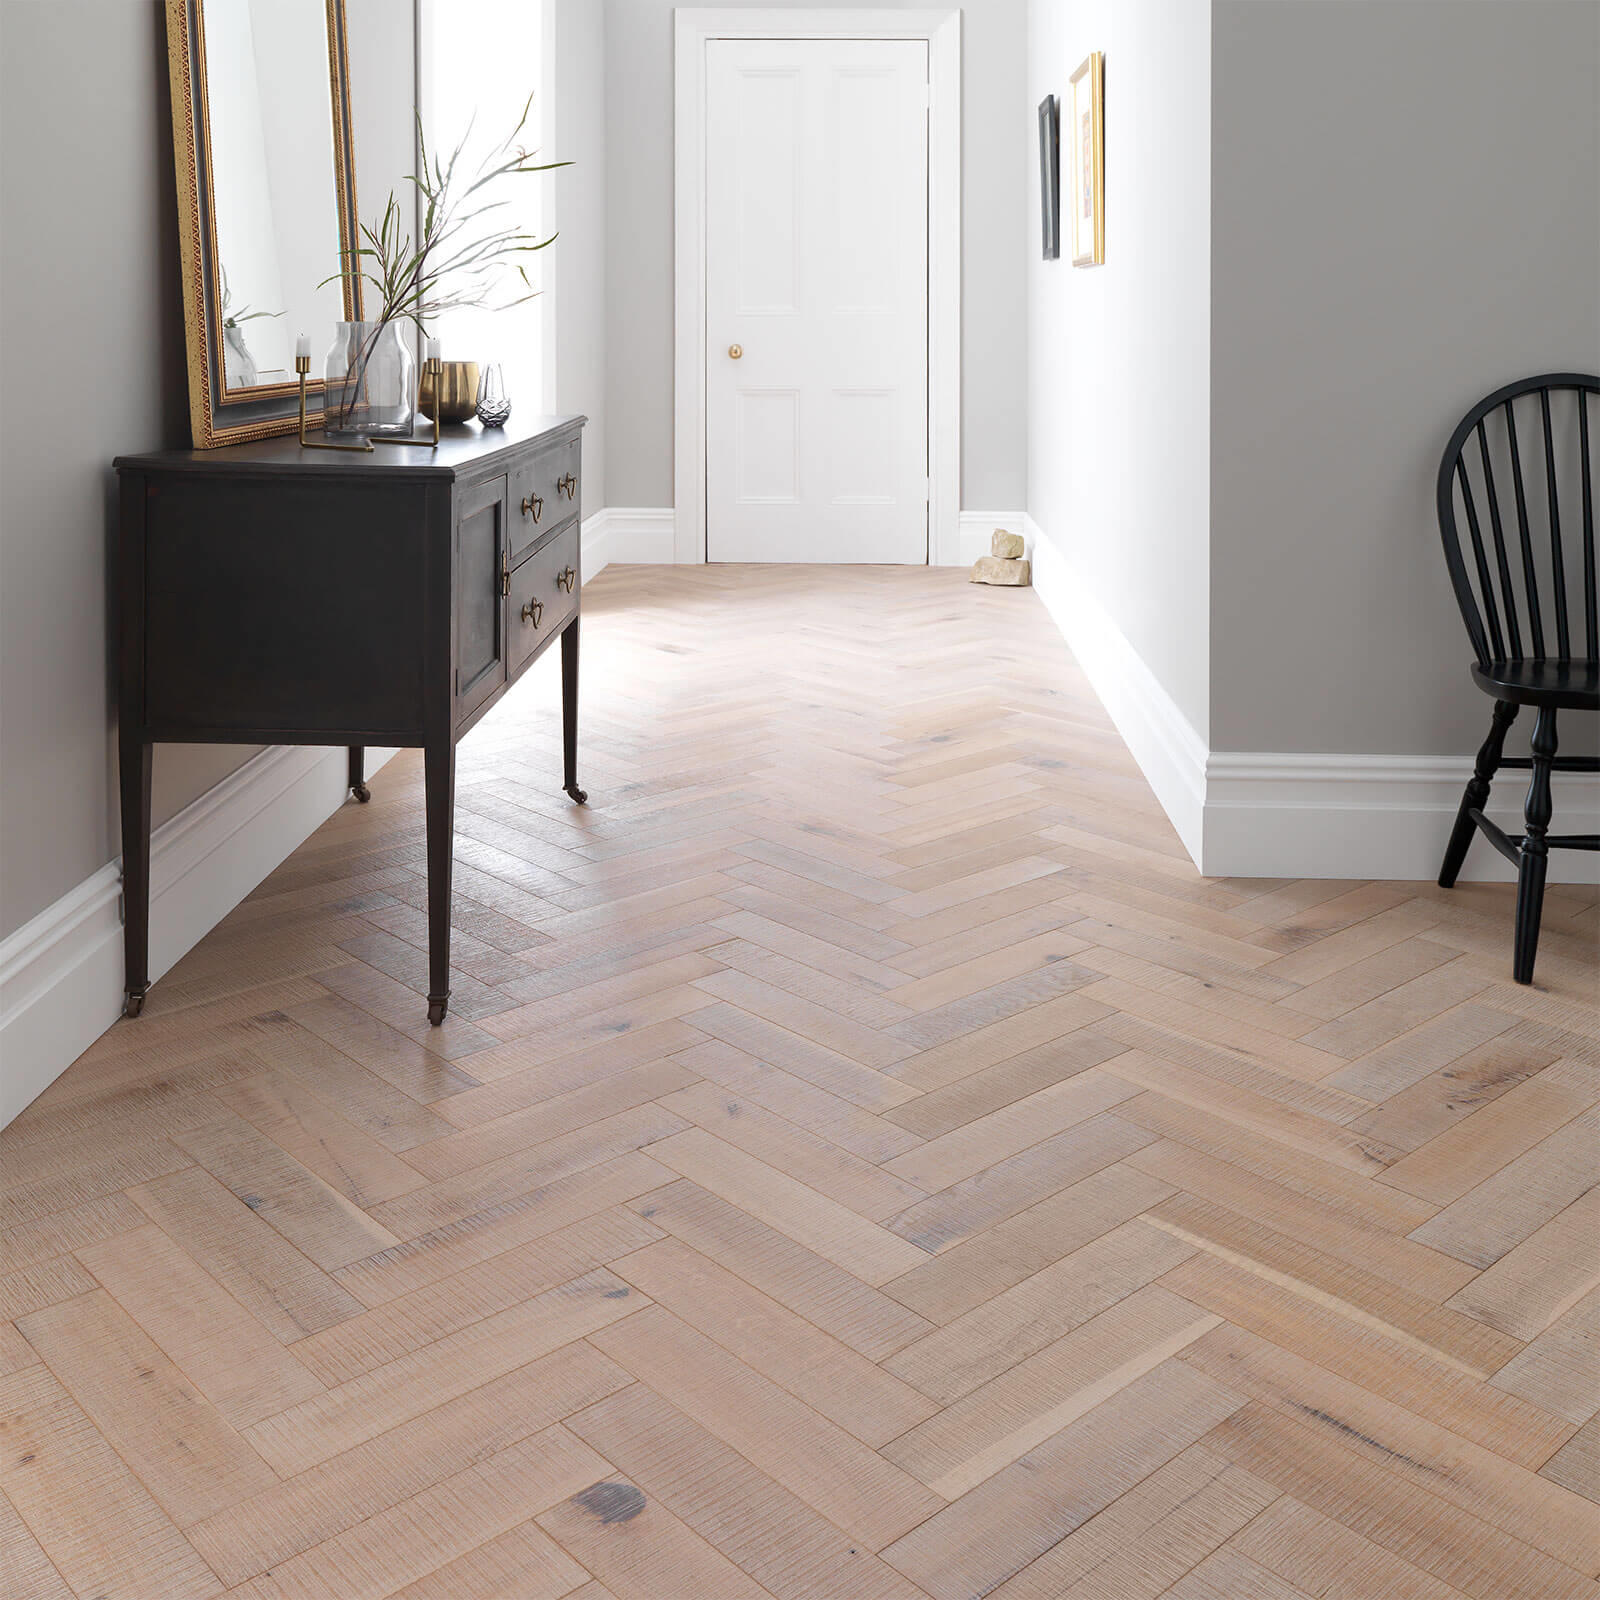 Wood Goodrich Herringbone Salted Oak Brushed Matt Lacquered Engineered Flooring 32 Sgr 001